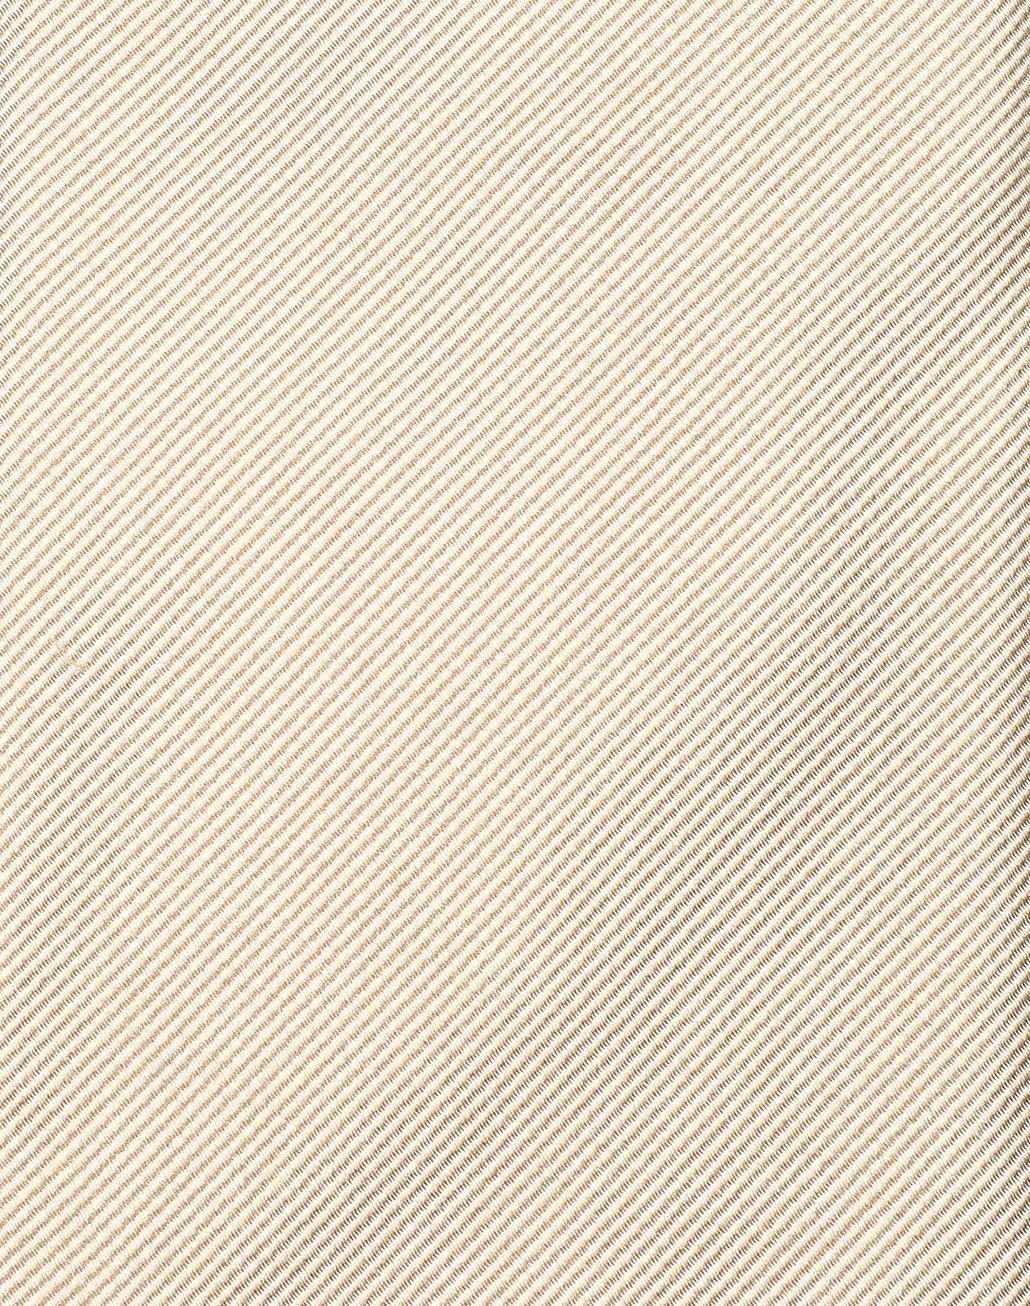 BRIONI Галстук с твиловым узором цвета шампанского Галстук [*** pickupInStoreShippingNotGuaranteed_info ***] e